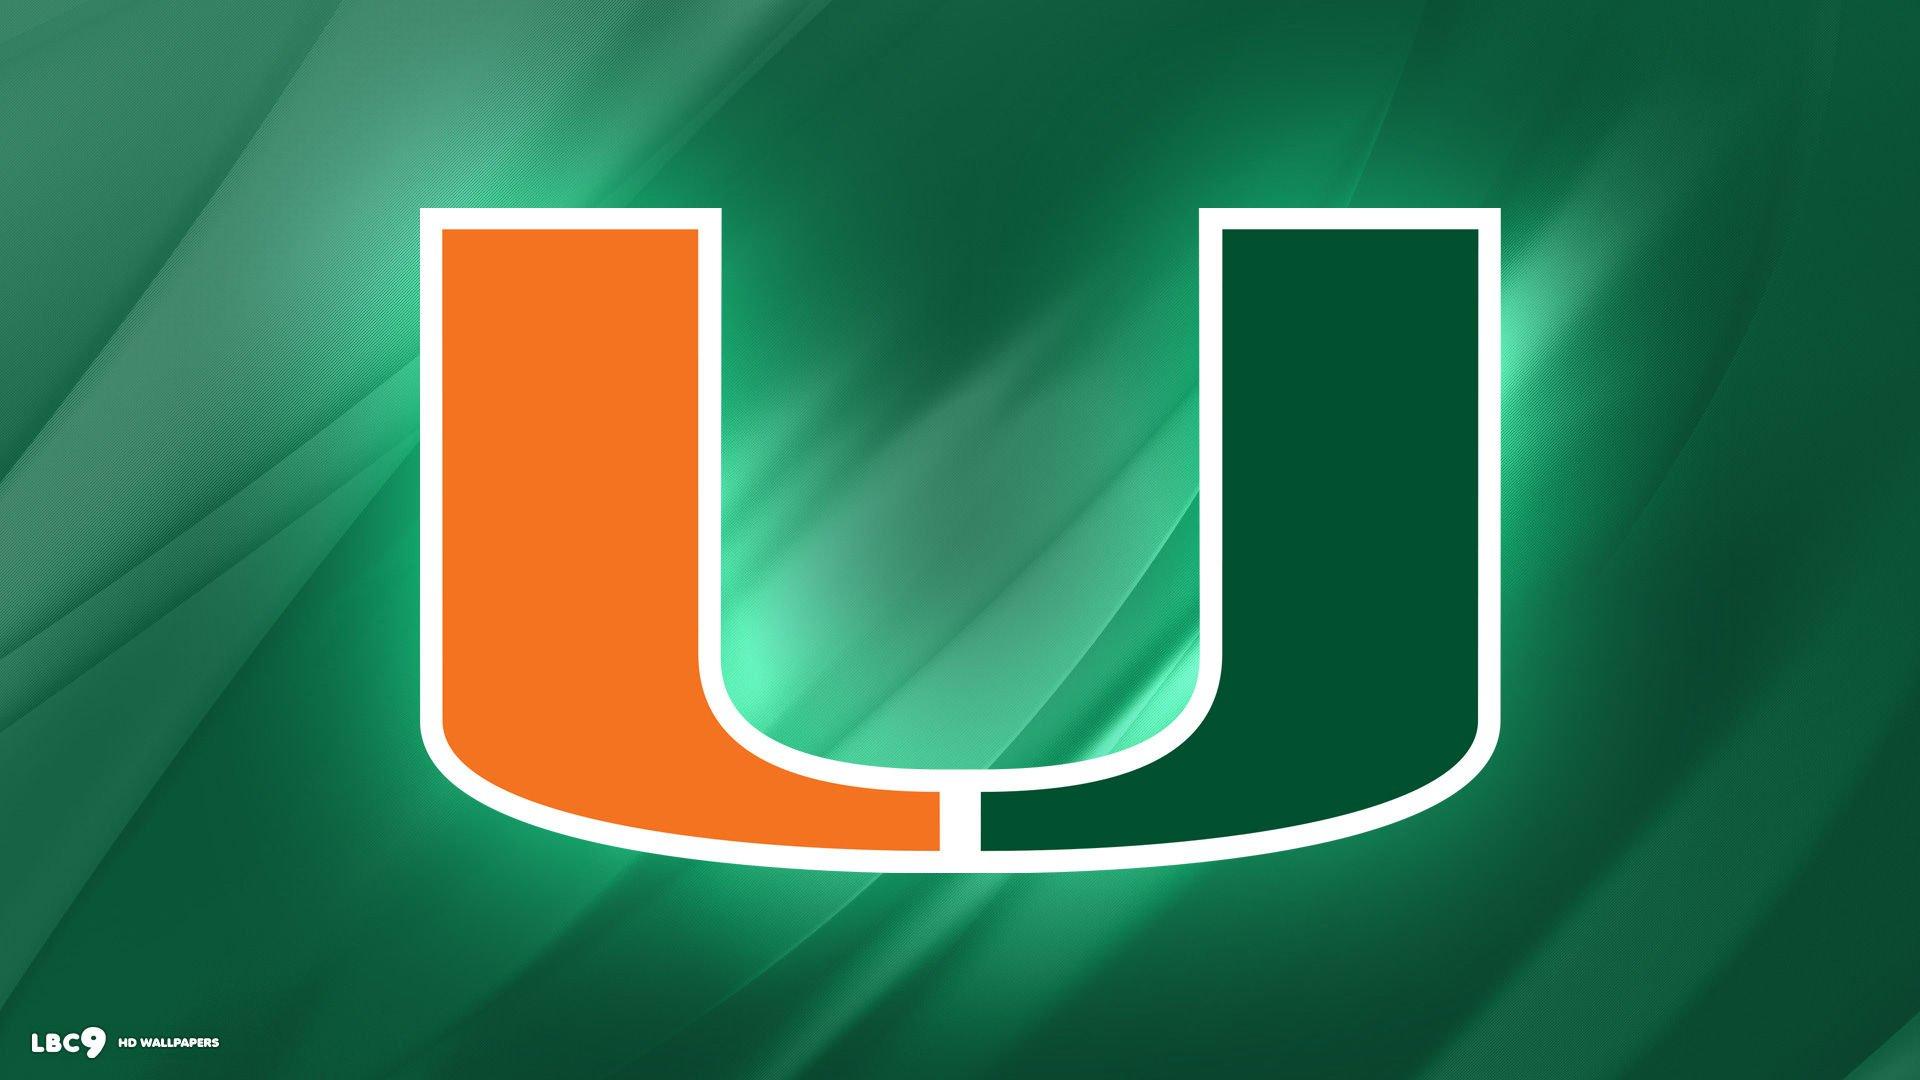 University Of Miami Hurricanes >> MIAMI HURRICANES college football wallpaper | 1920x1080 | 593464 | WallpaperUP